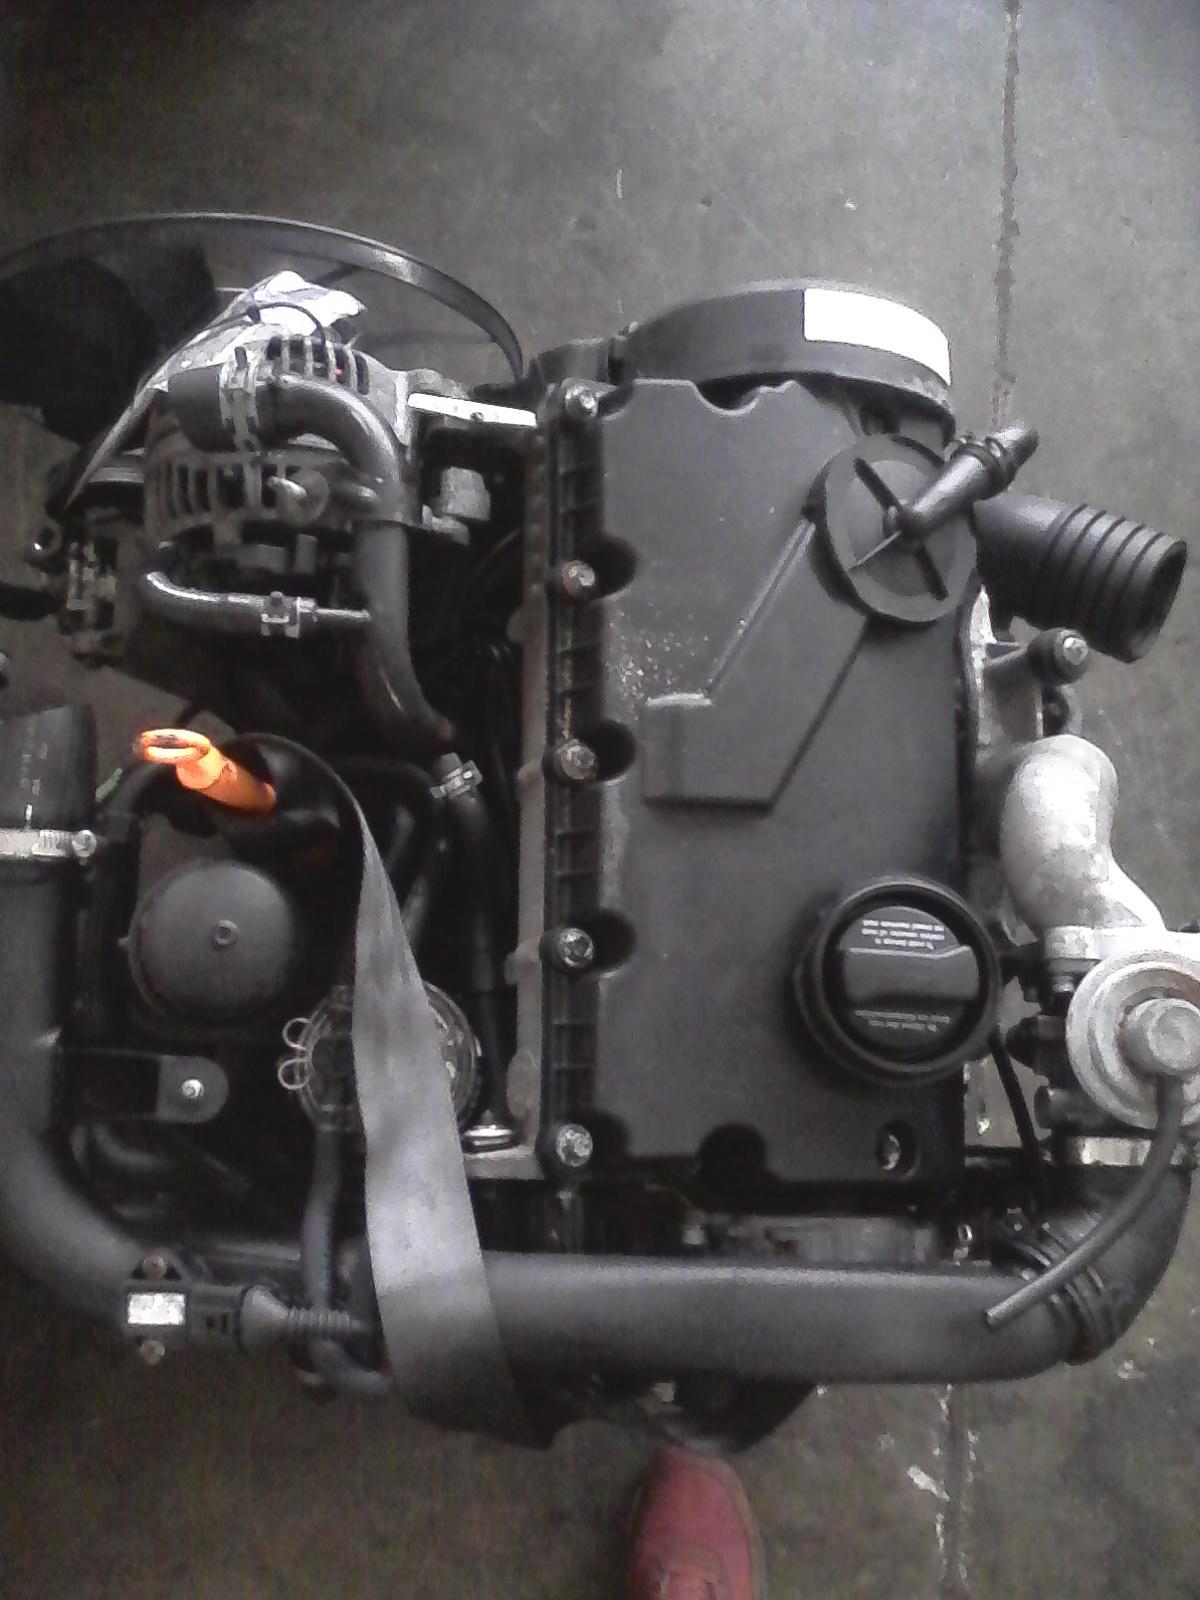 Vw Golf 1 9tdi Engine For Sale Johannesburg Public Ads